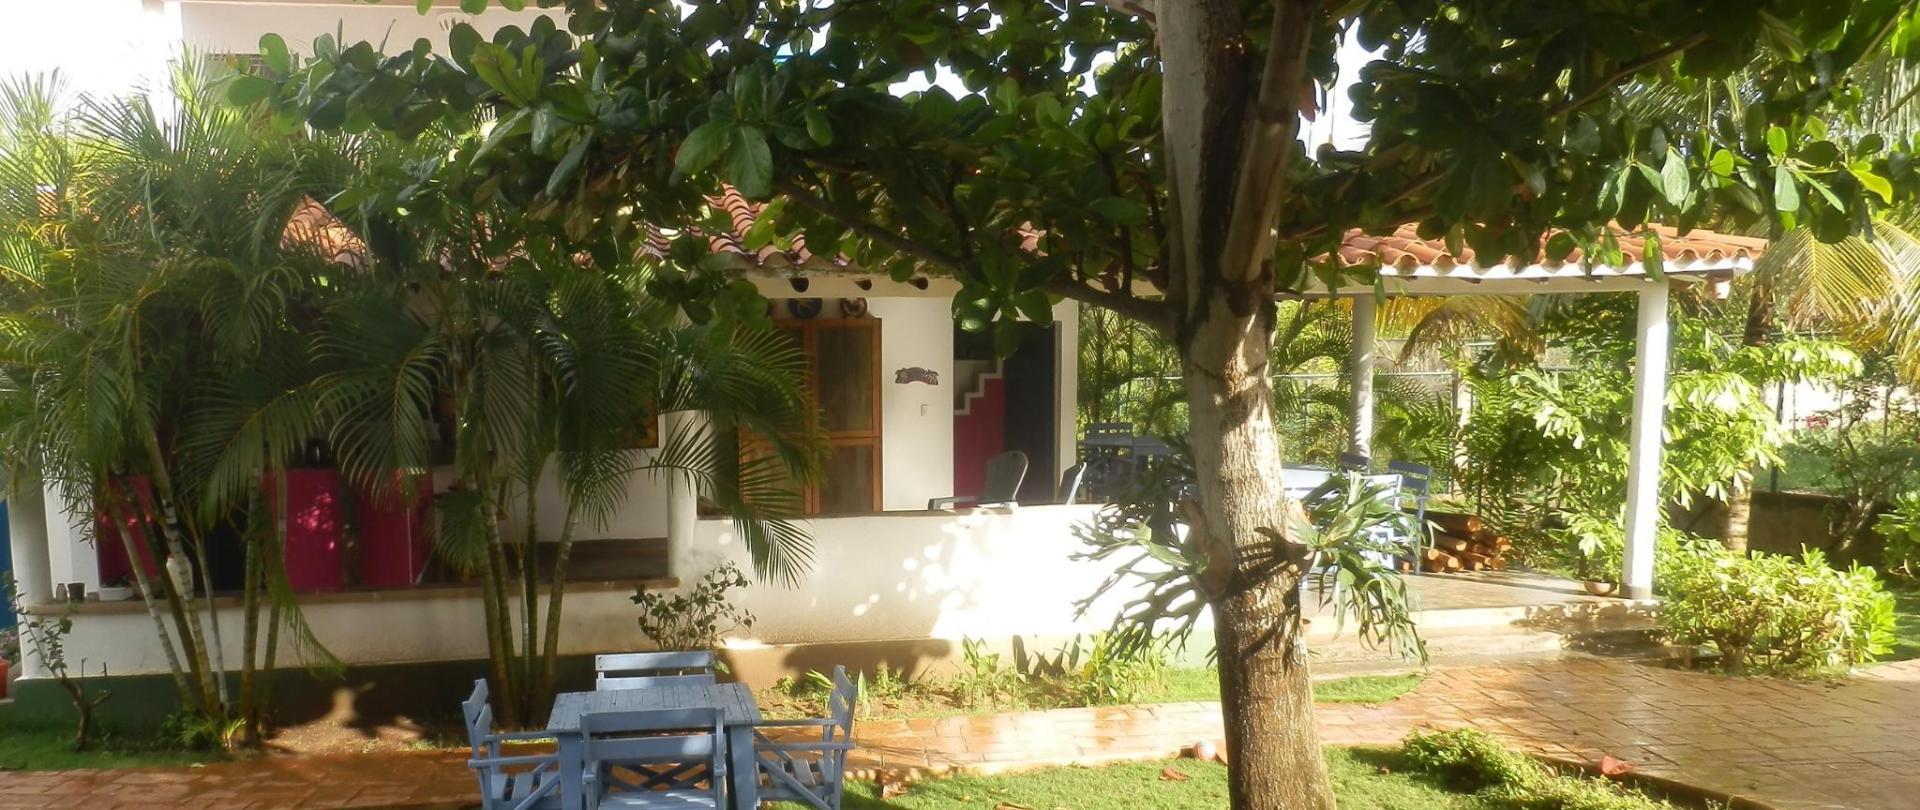 Casa Las Trinitarias j6.jpg